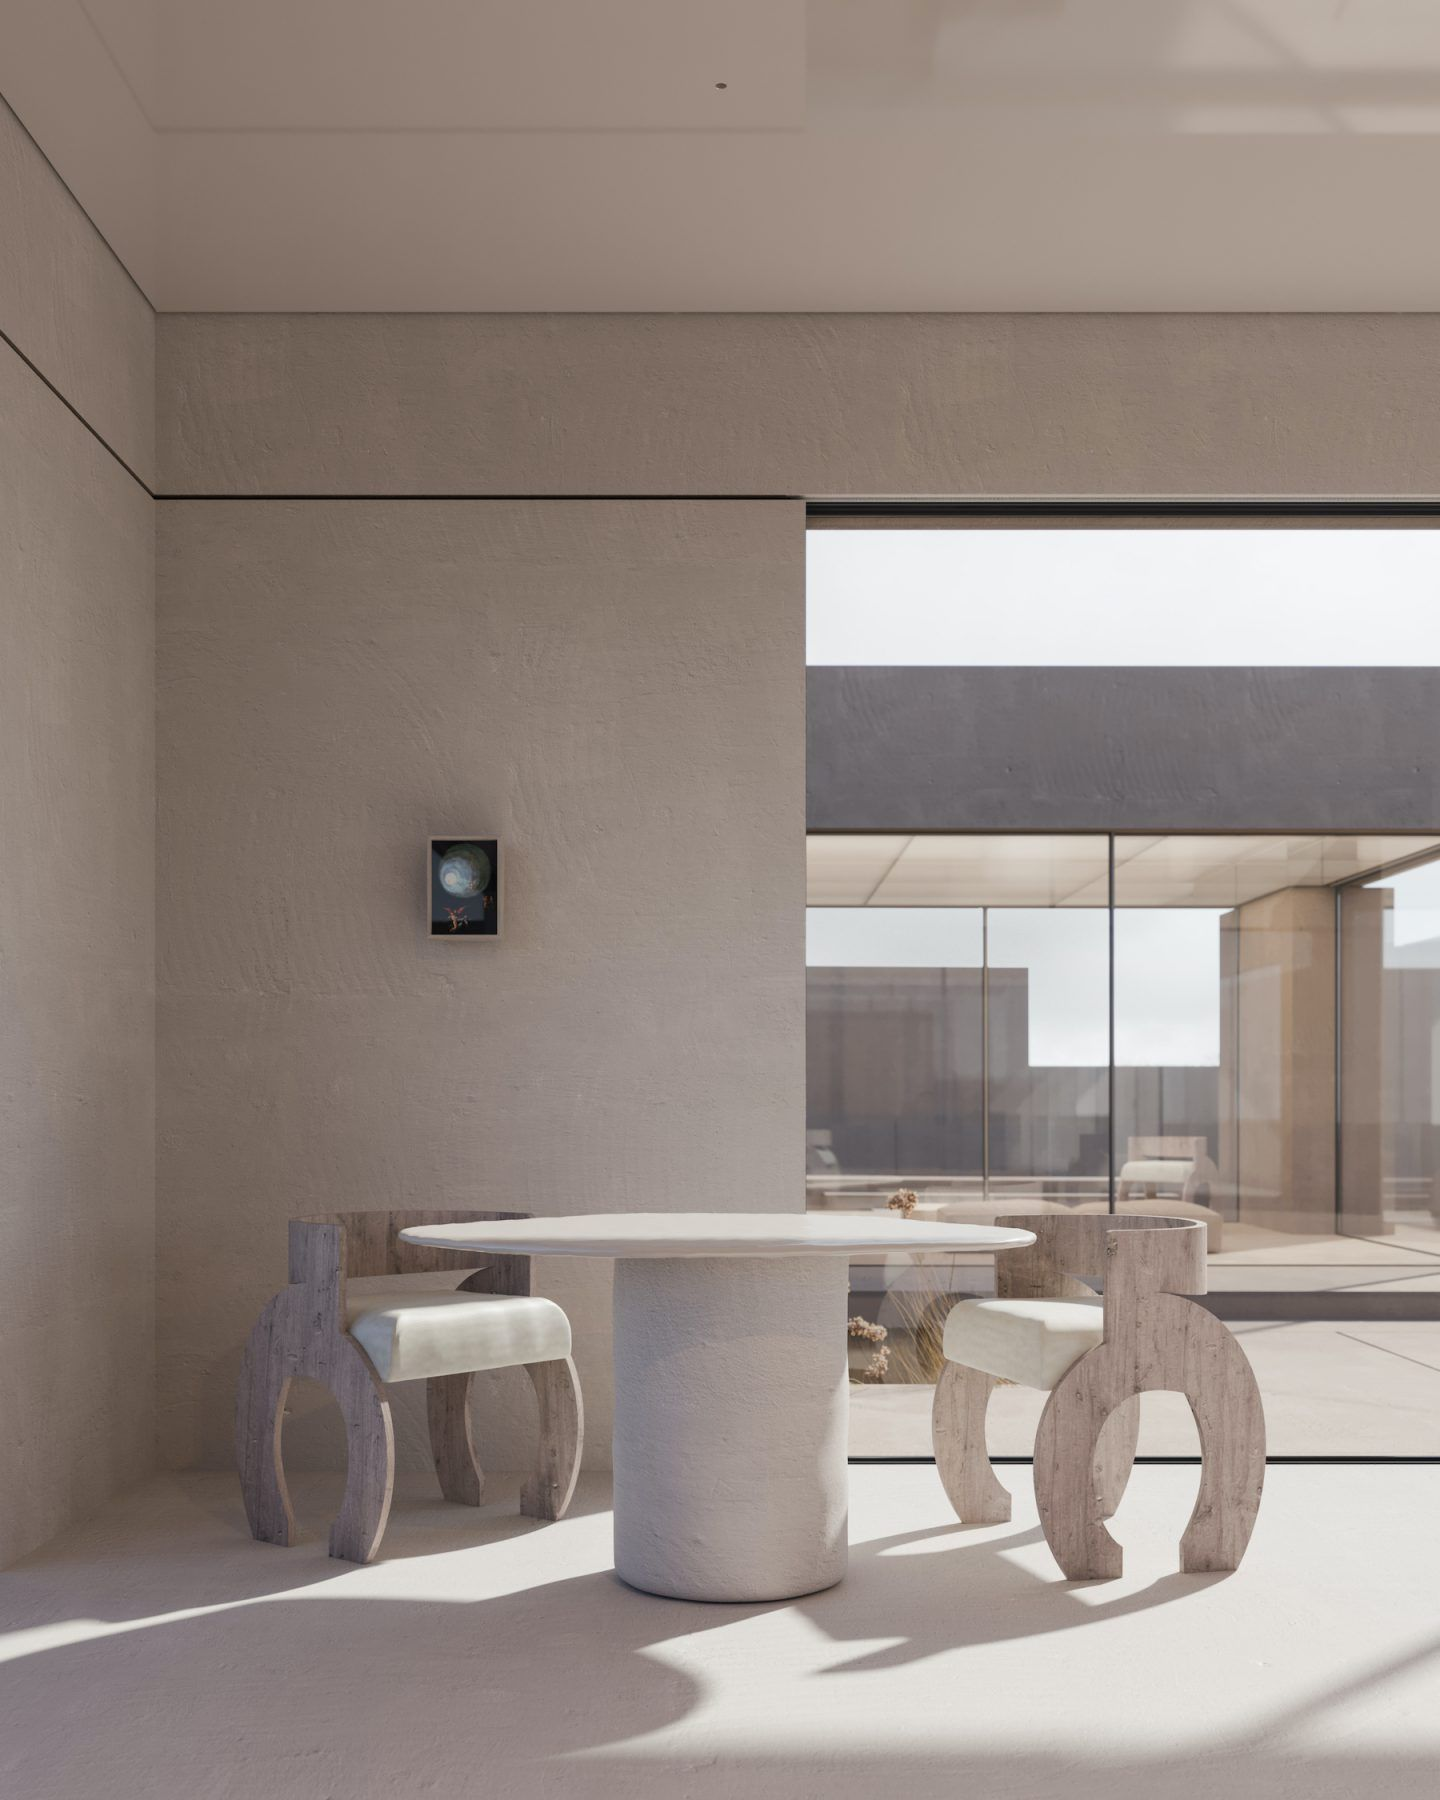 IGNANT-Design-Kanstantsin-Remez-II-Introvert-Residence-012